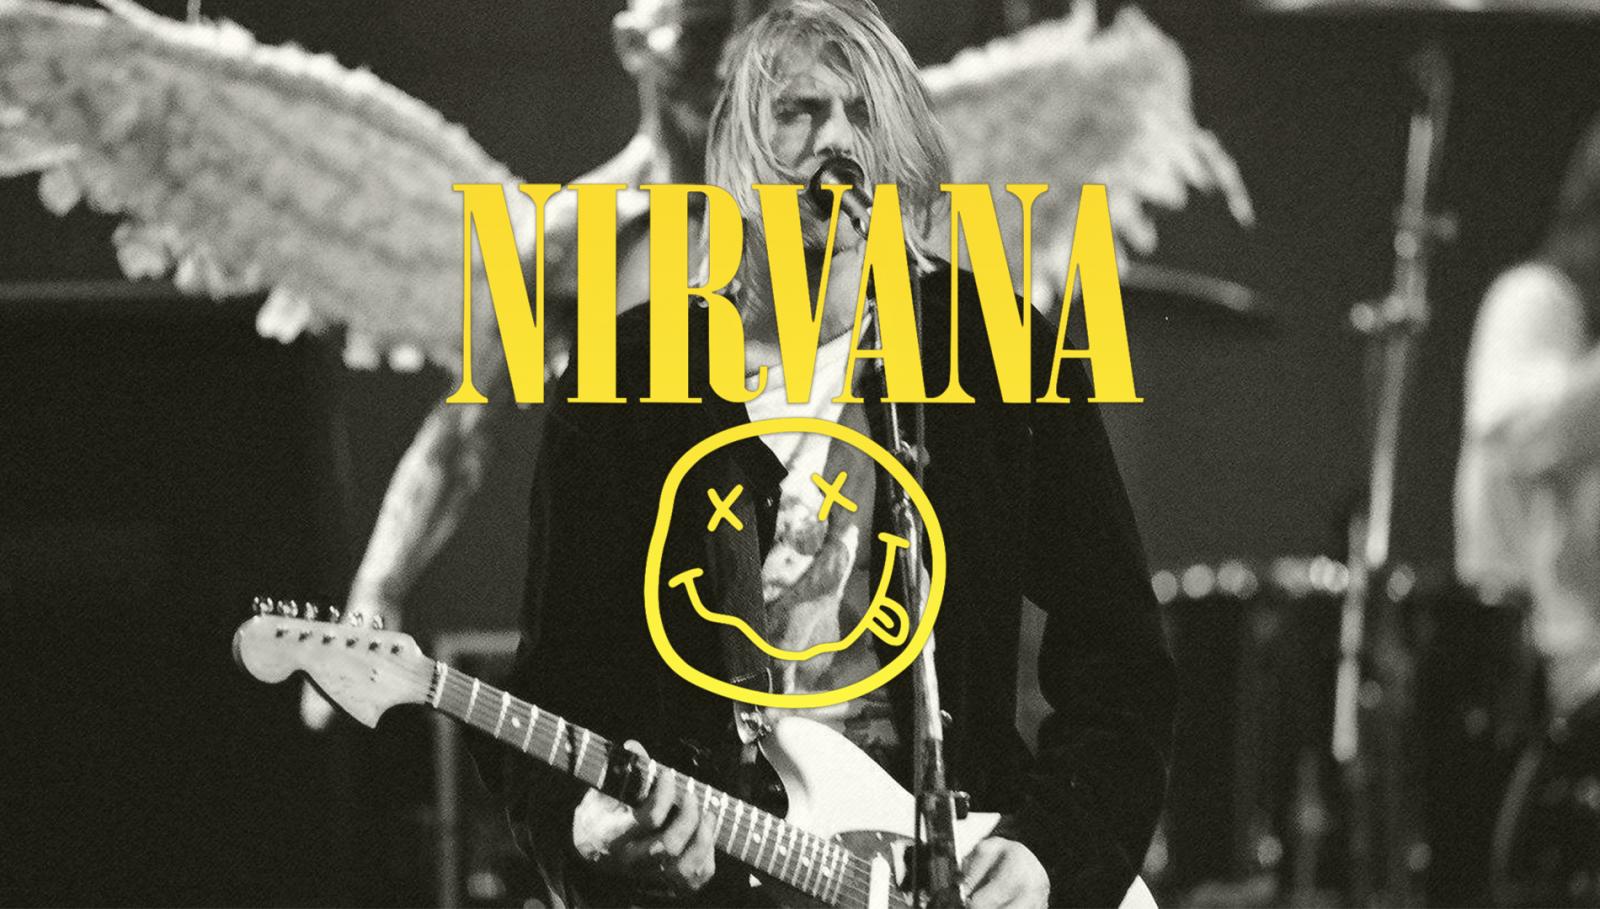 Fondos de pantalla : Nirvana Grunge rock Kurt Cobain